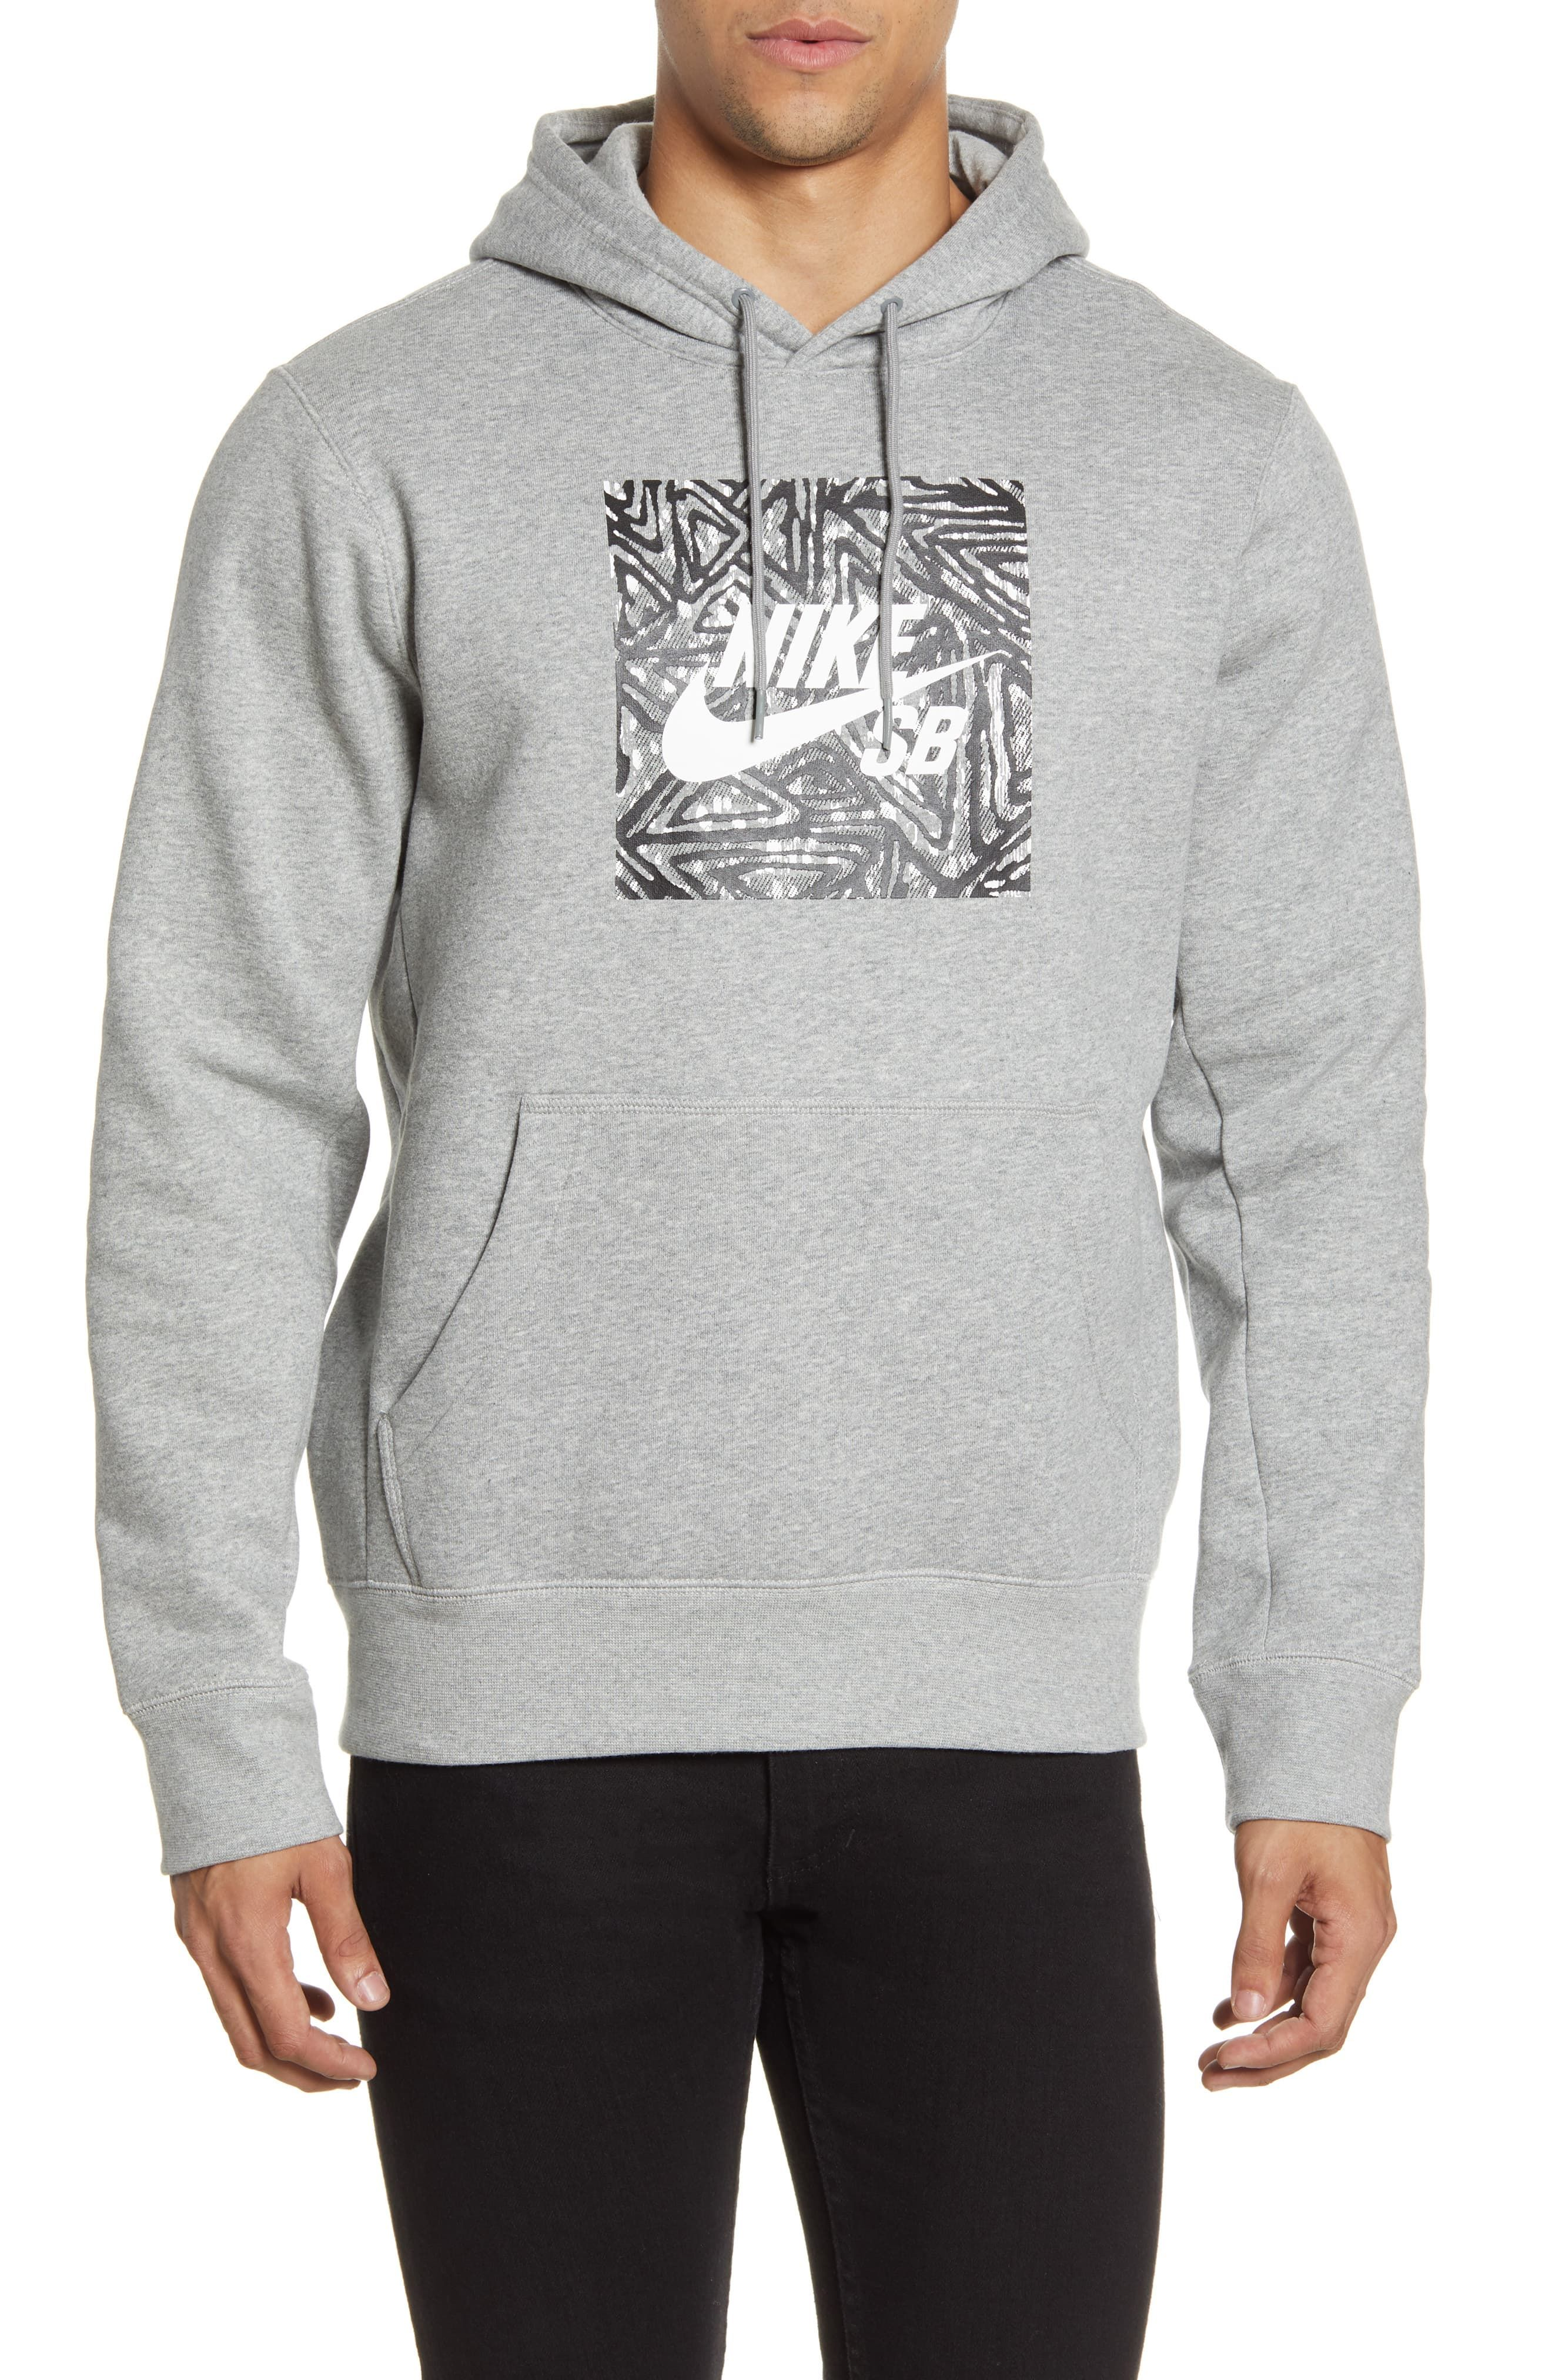 Predownload: Nike Sb Triangle Graphic Hoodie Nordstrom Graphic Hoodies Hoodies Hoodie Fashion [ 4048 x 2640 Pixel ]